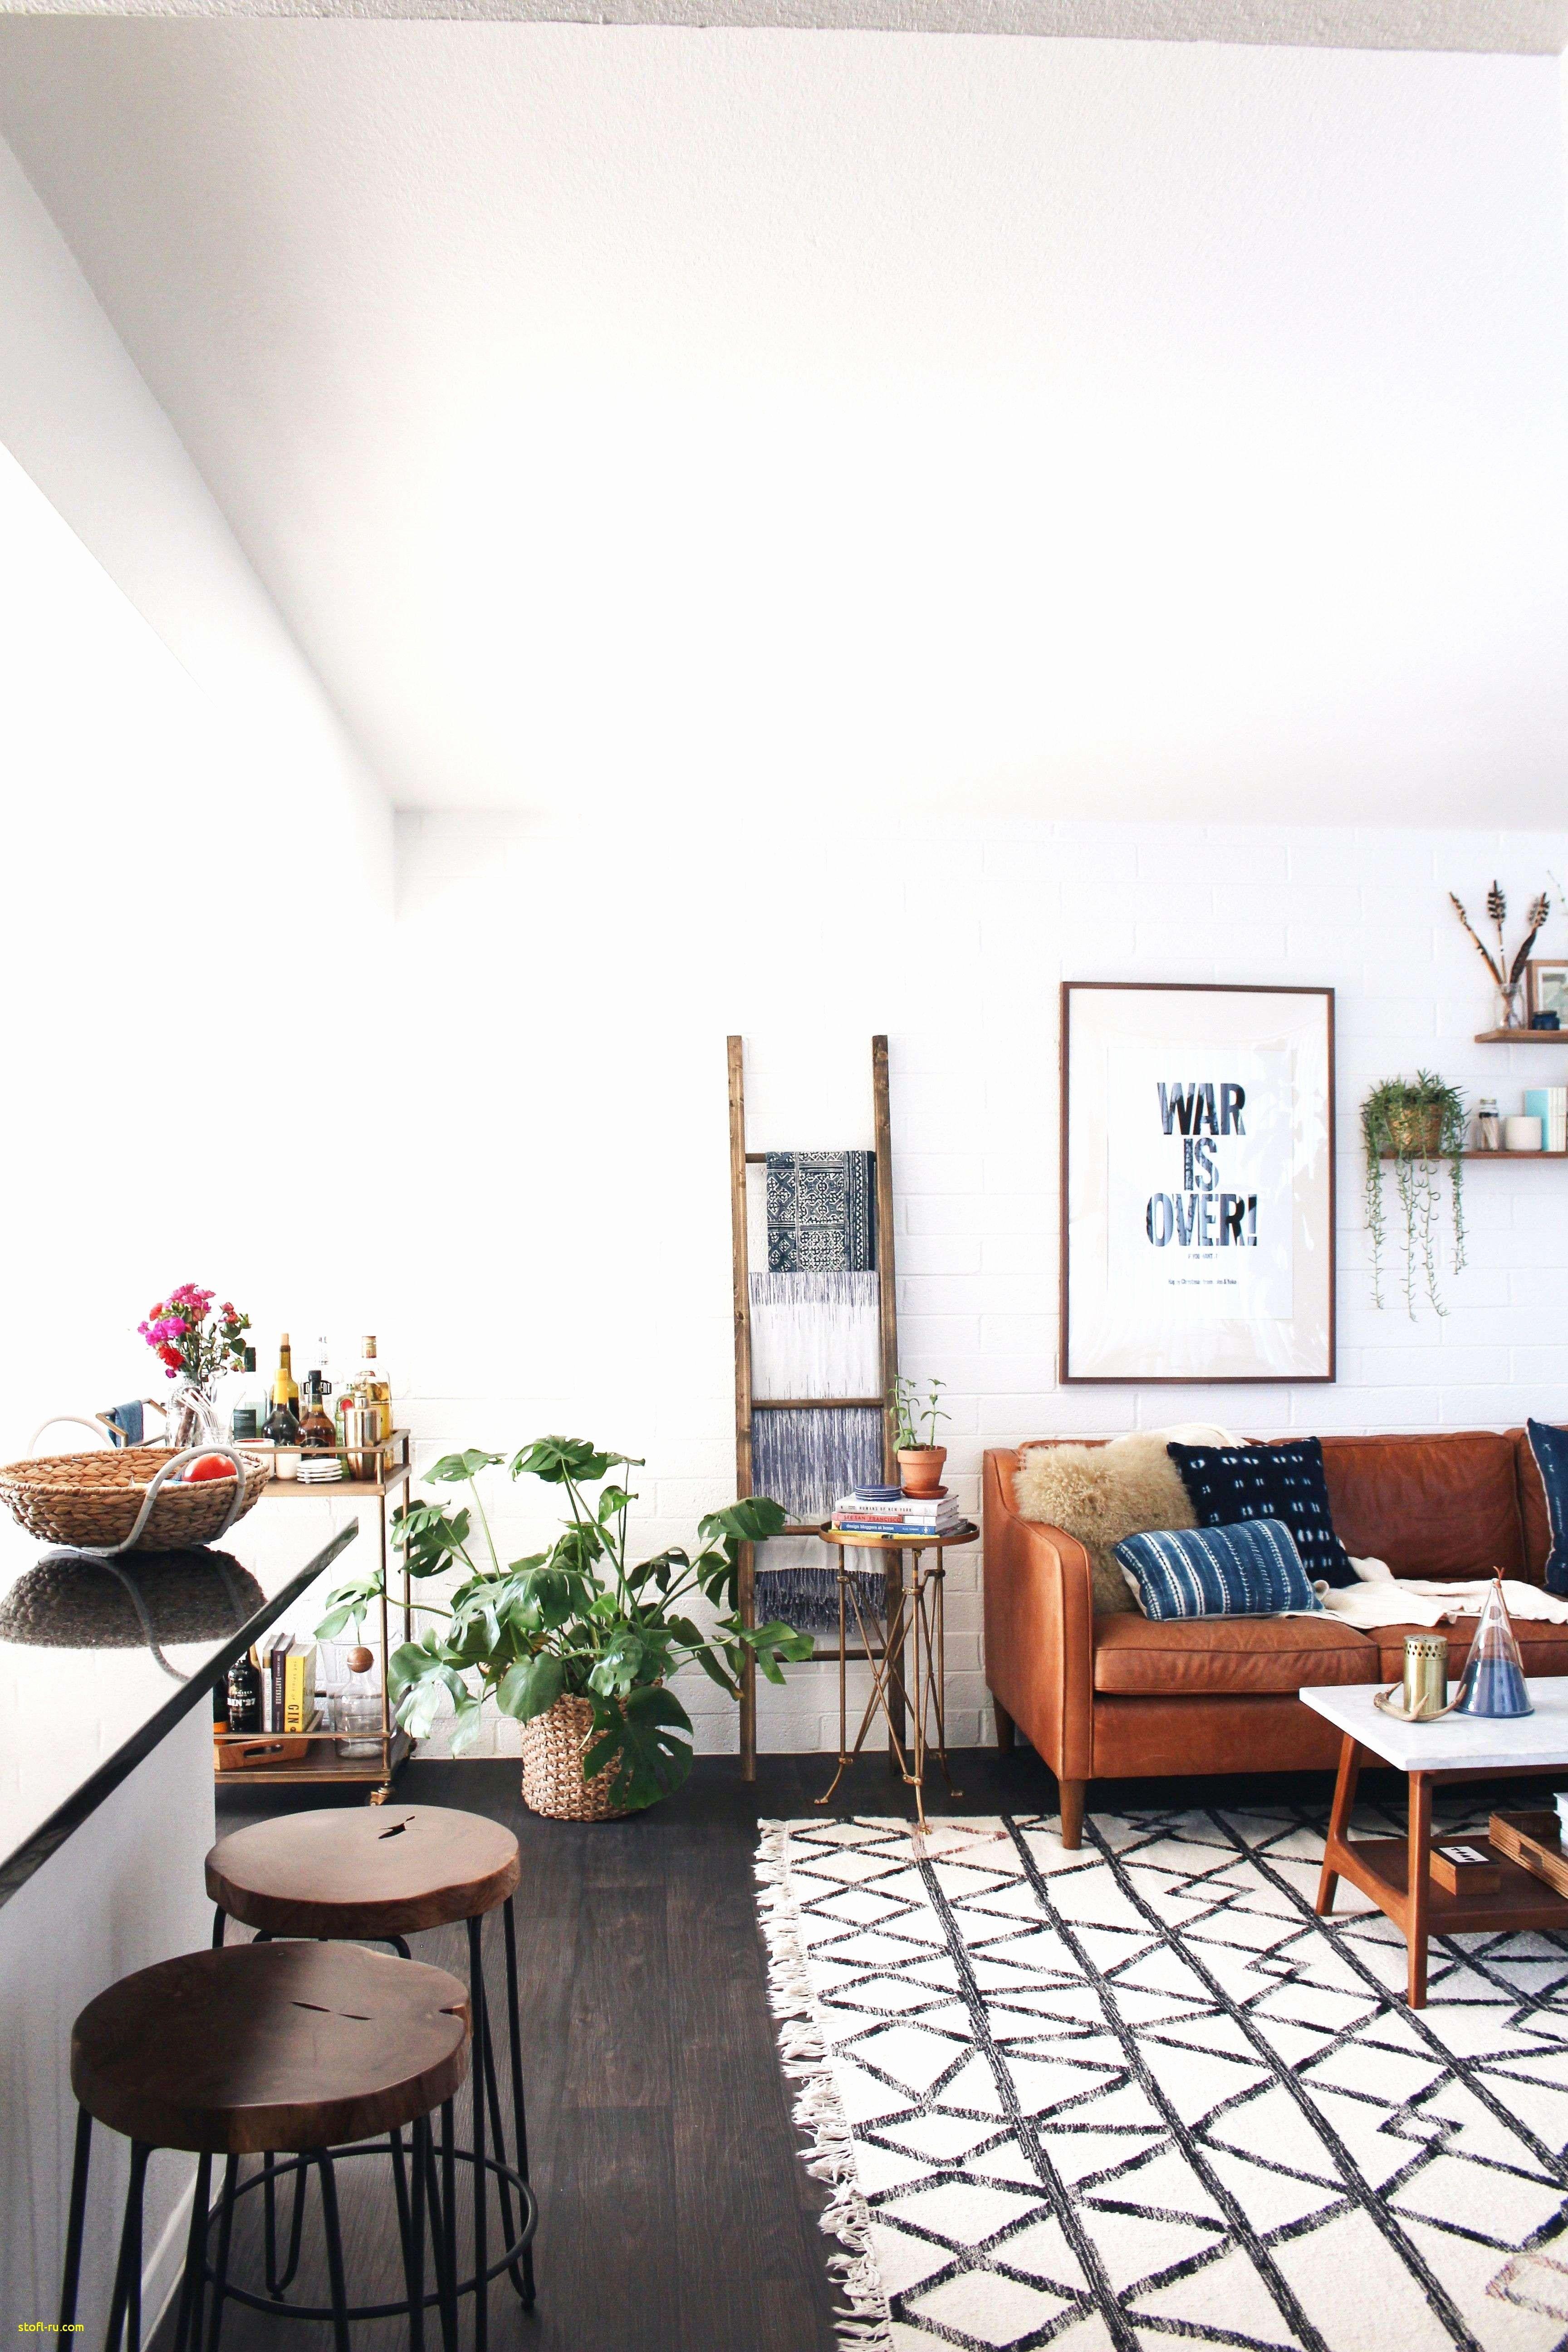 Pin Oleh Jooana Di Idee Deco Di 2018 Pinterest Wohnzimmer